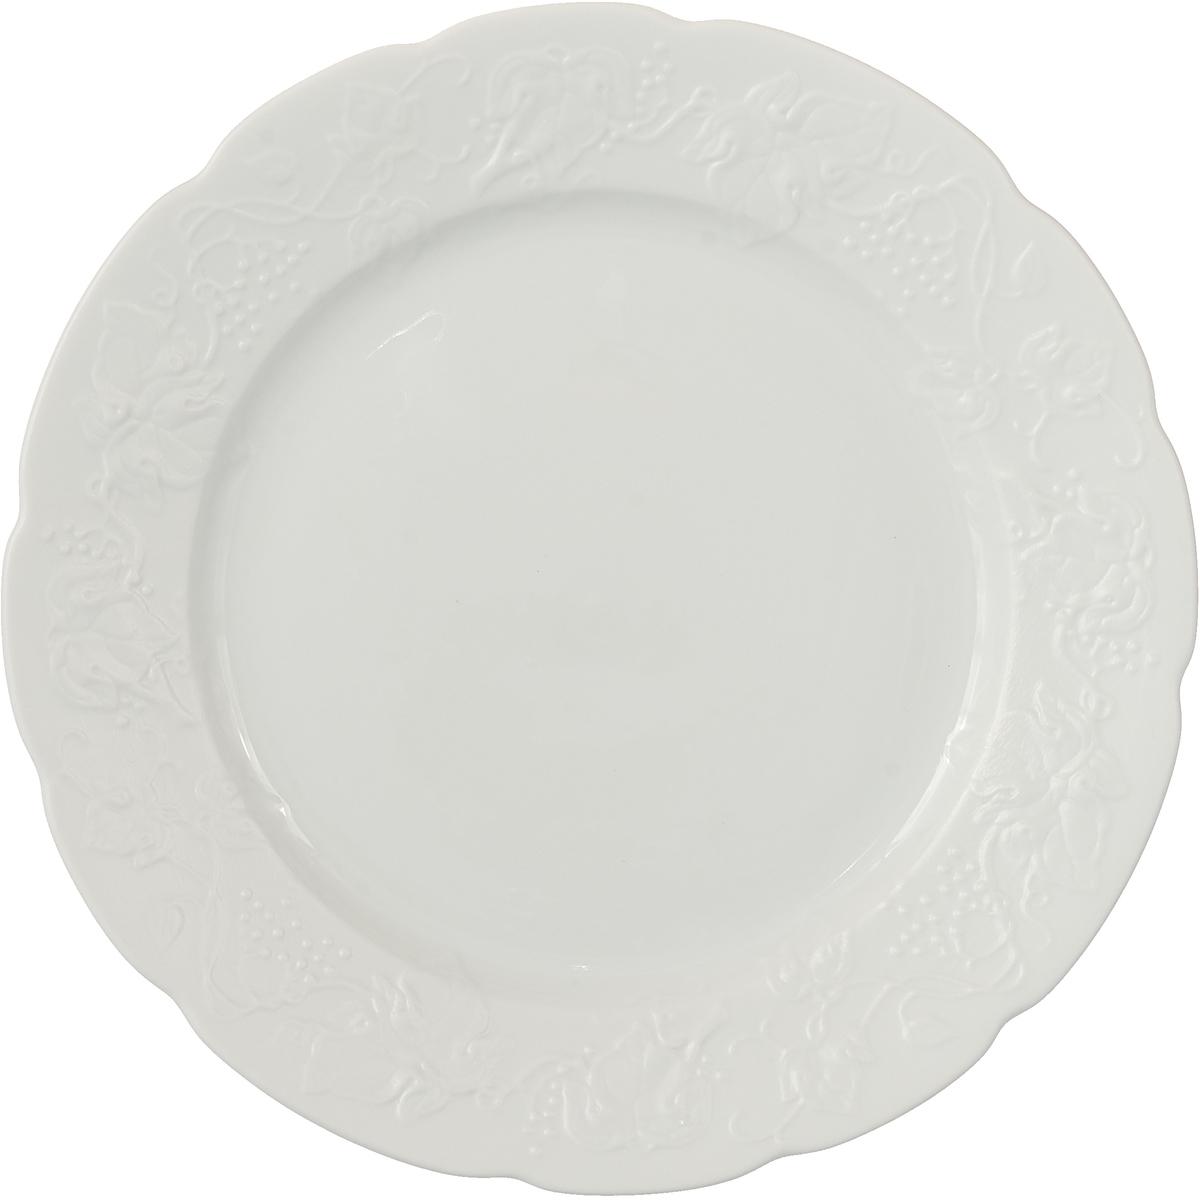 Тарелка La Rose des Sables Blanc, 3100126, белый, диаметр 26 см